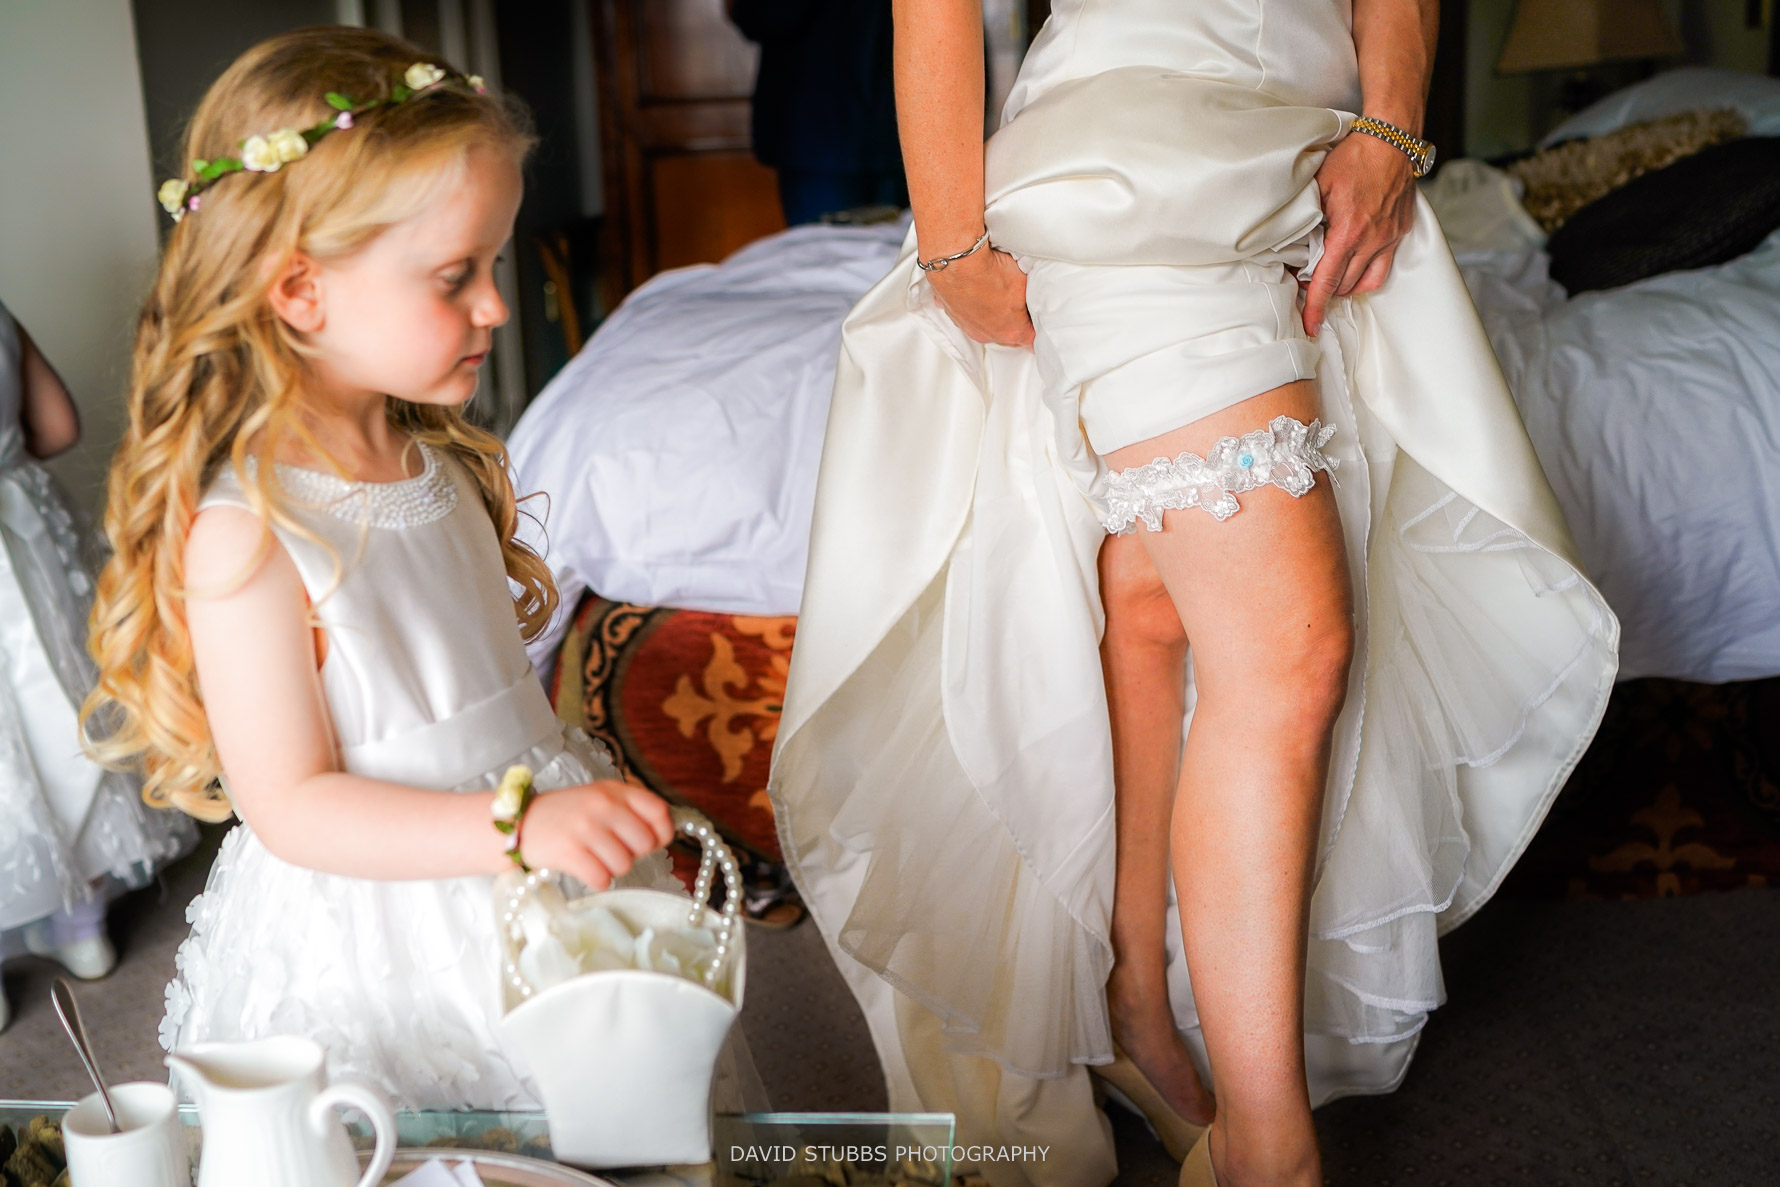 putting the garter on her leg